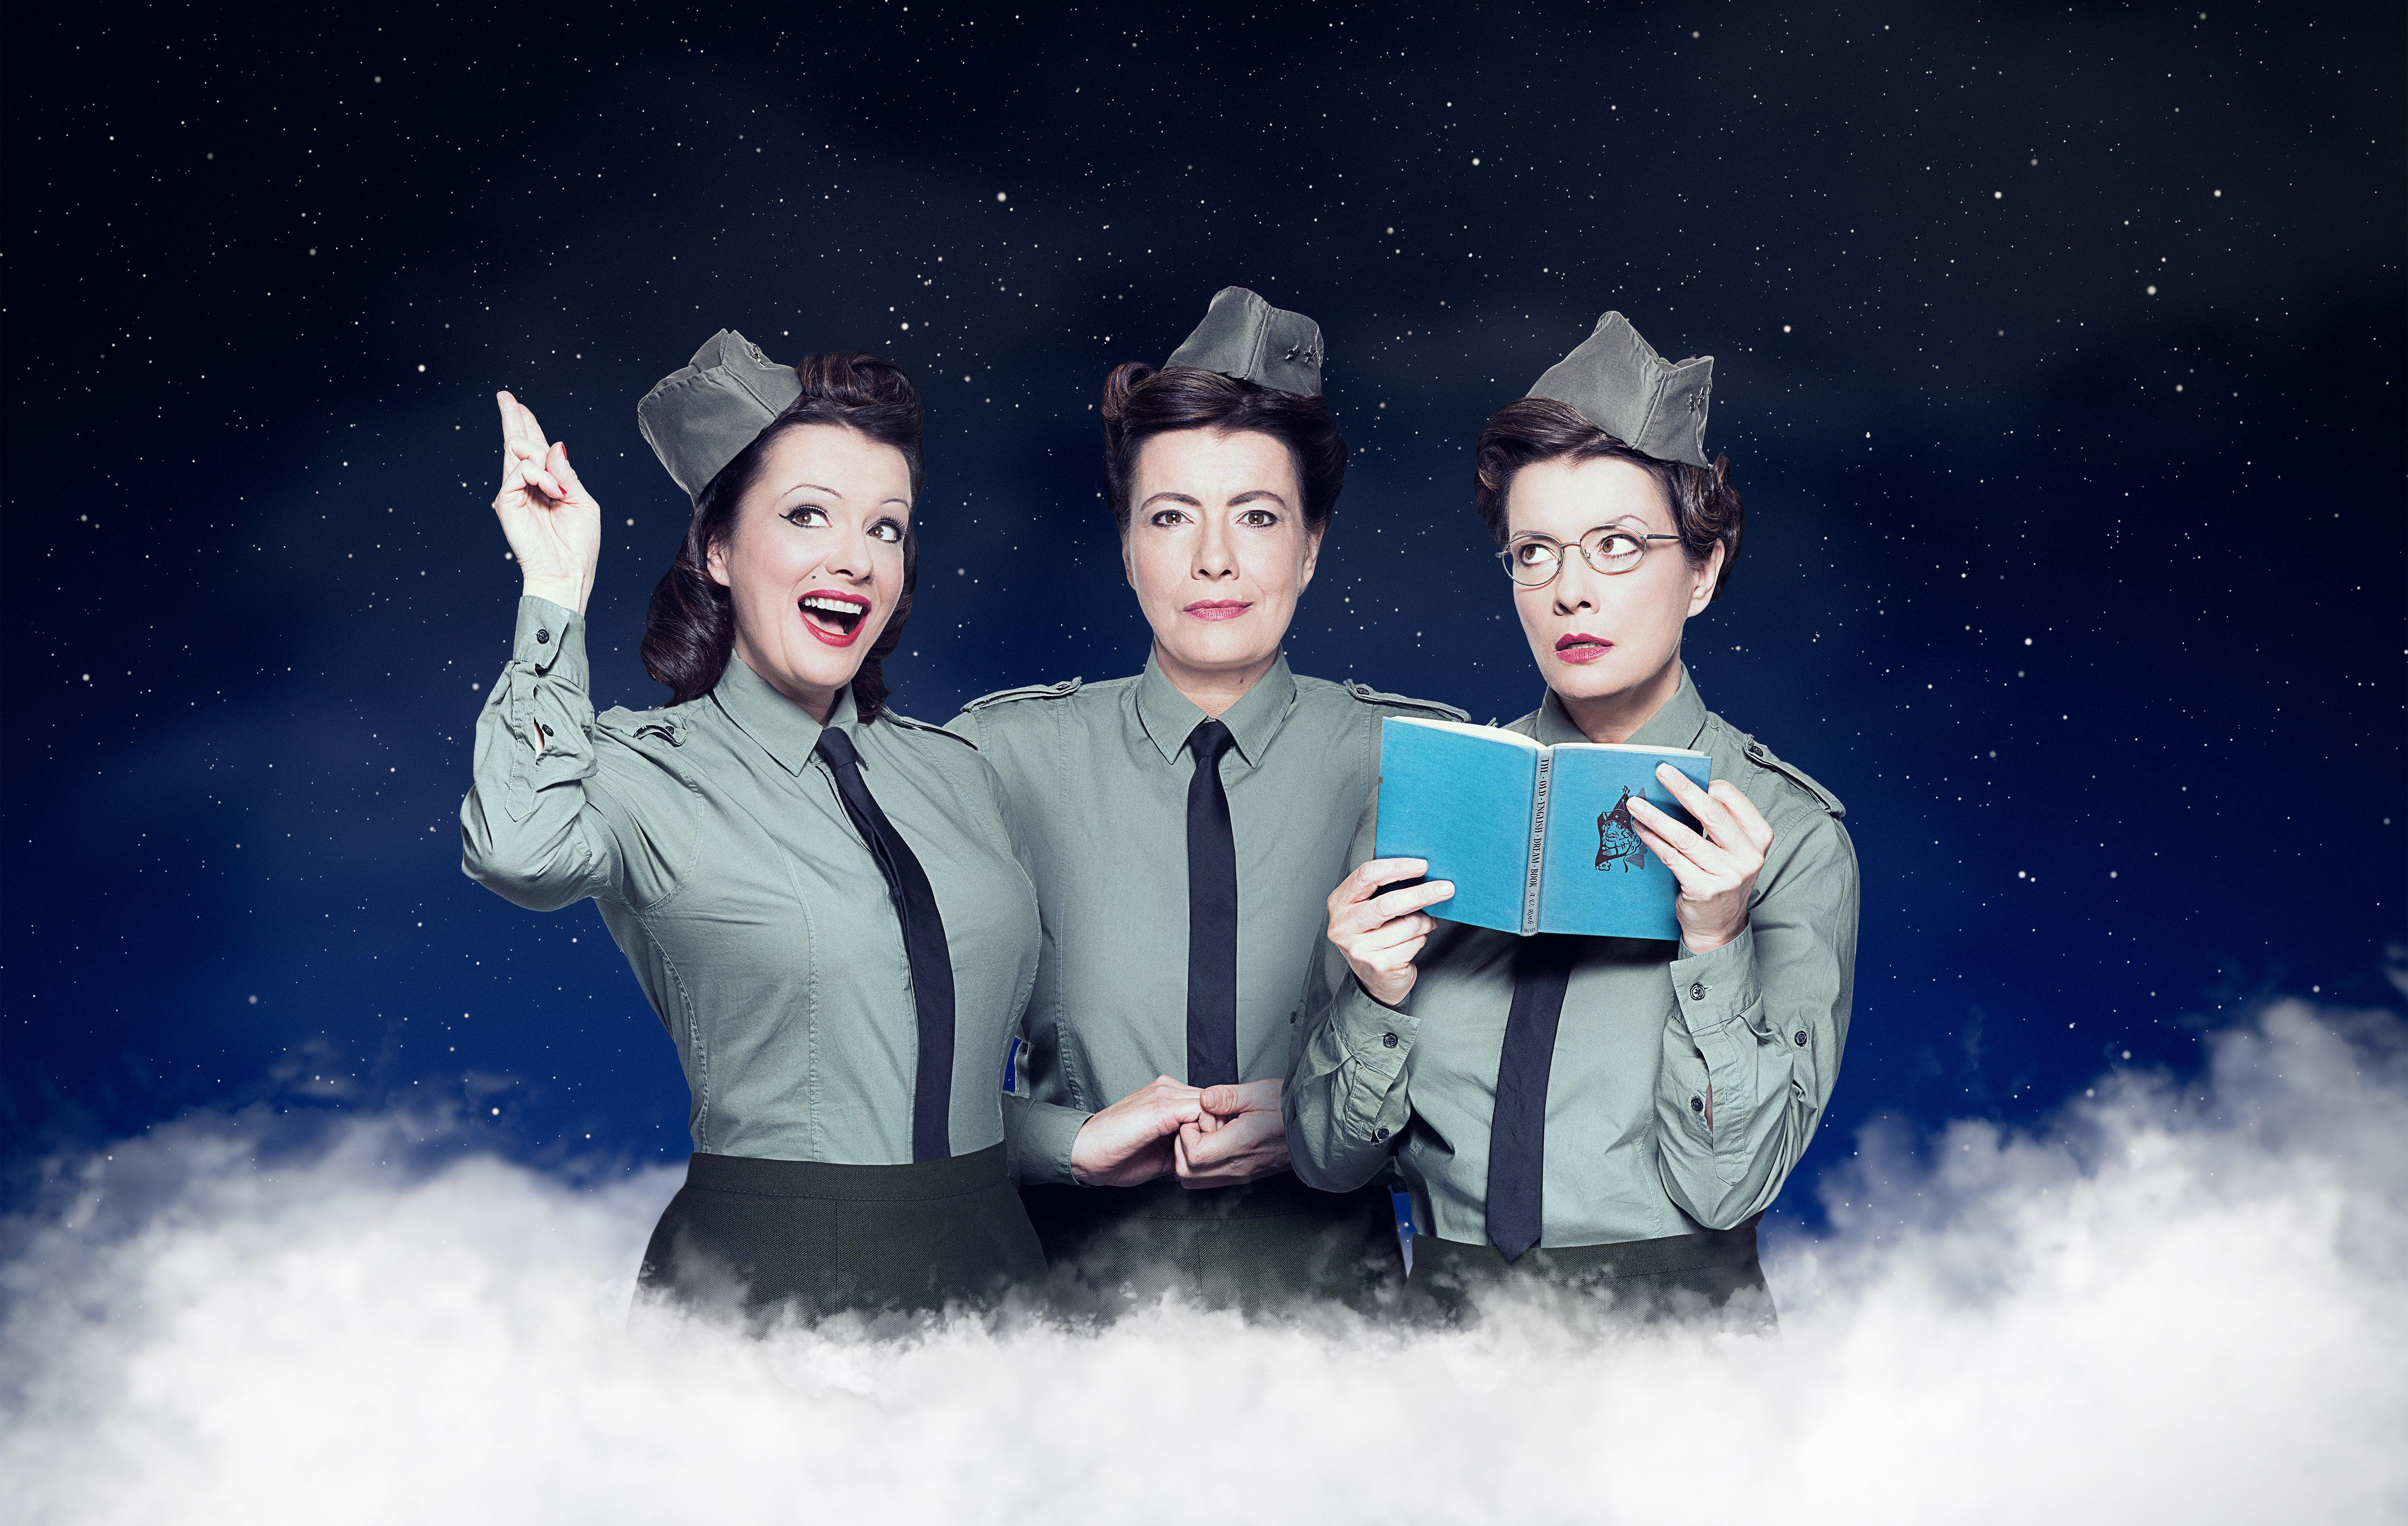 Eddie & the Slumbers Sisters - Full Tour Announced